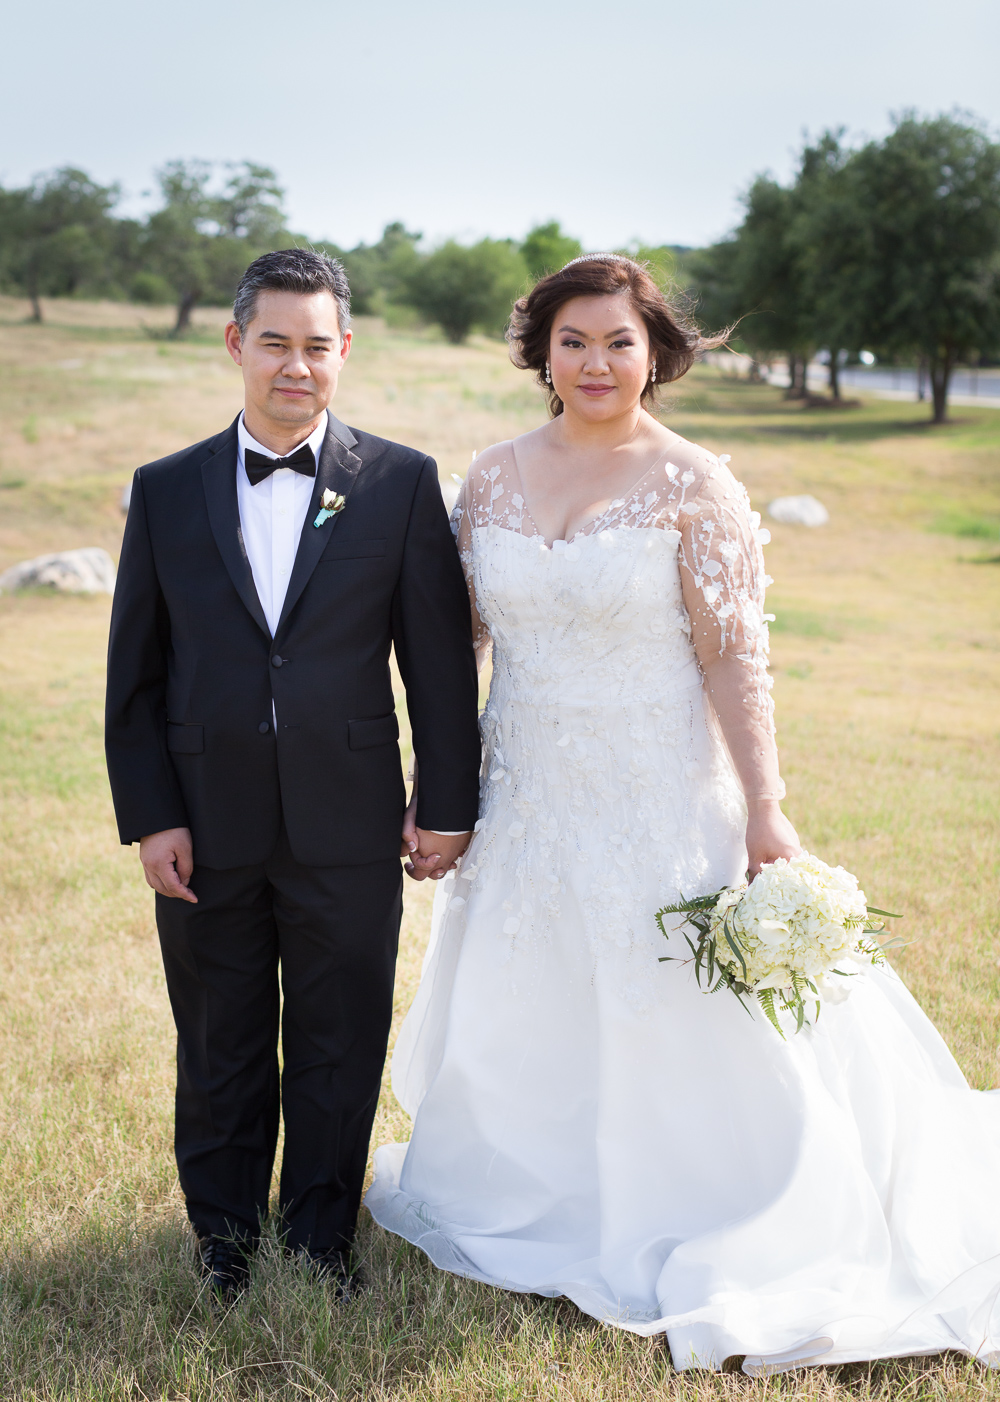 Wedding-photography-and-films-austin-092.jpg